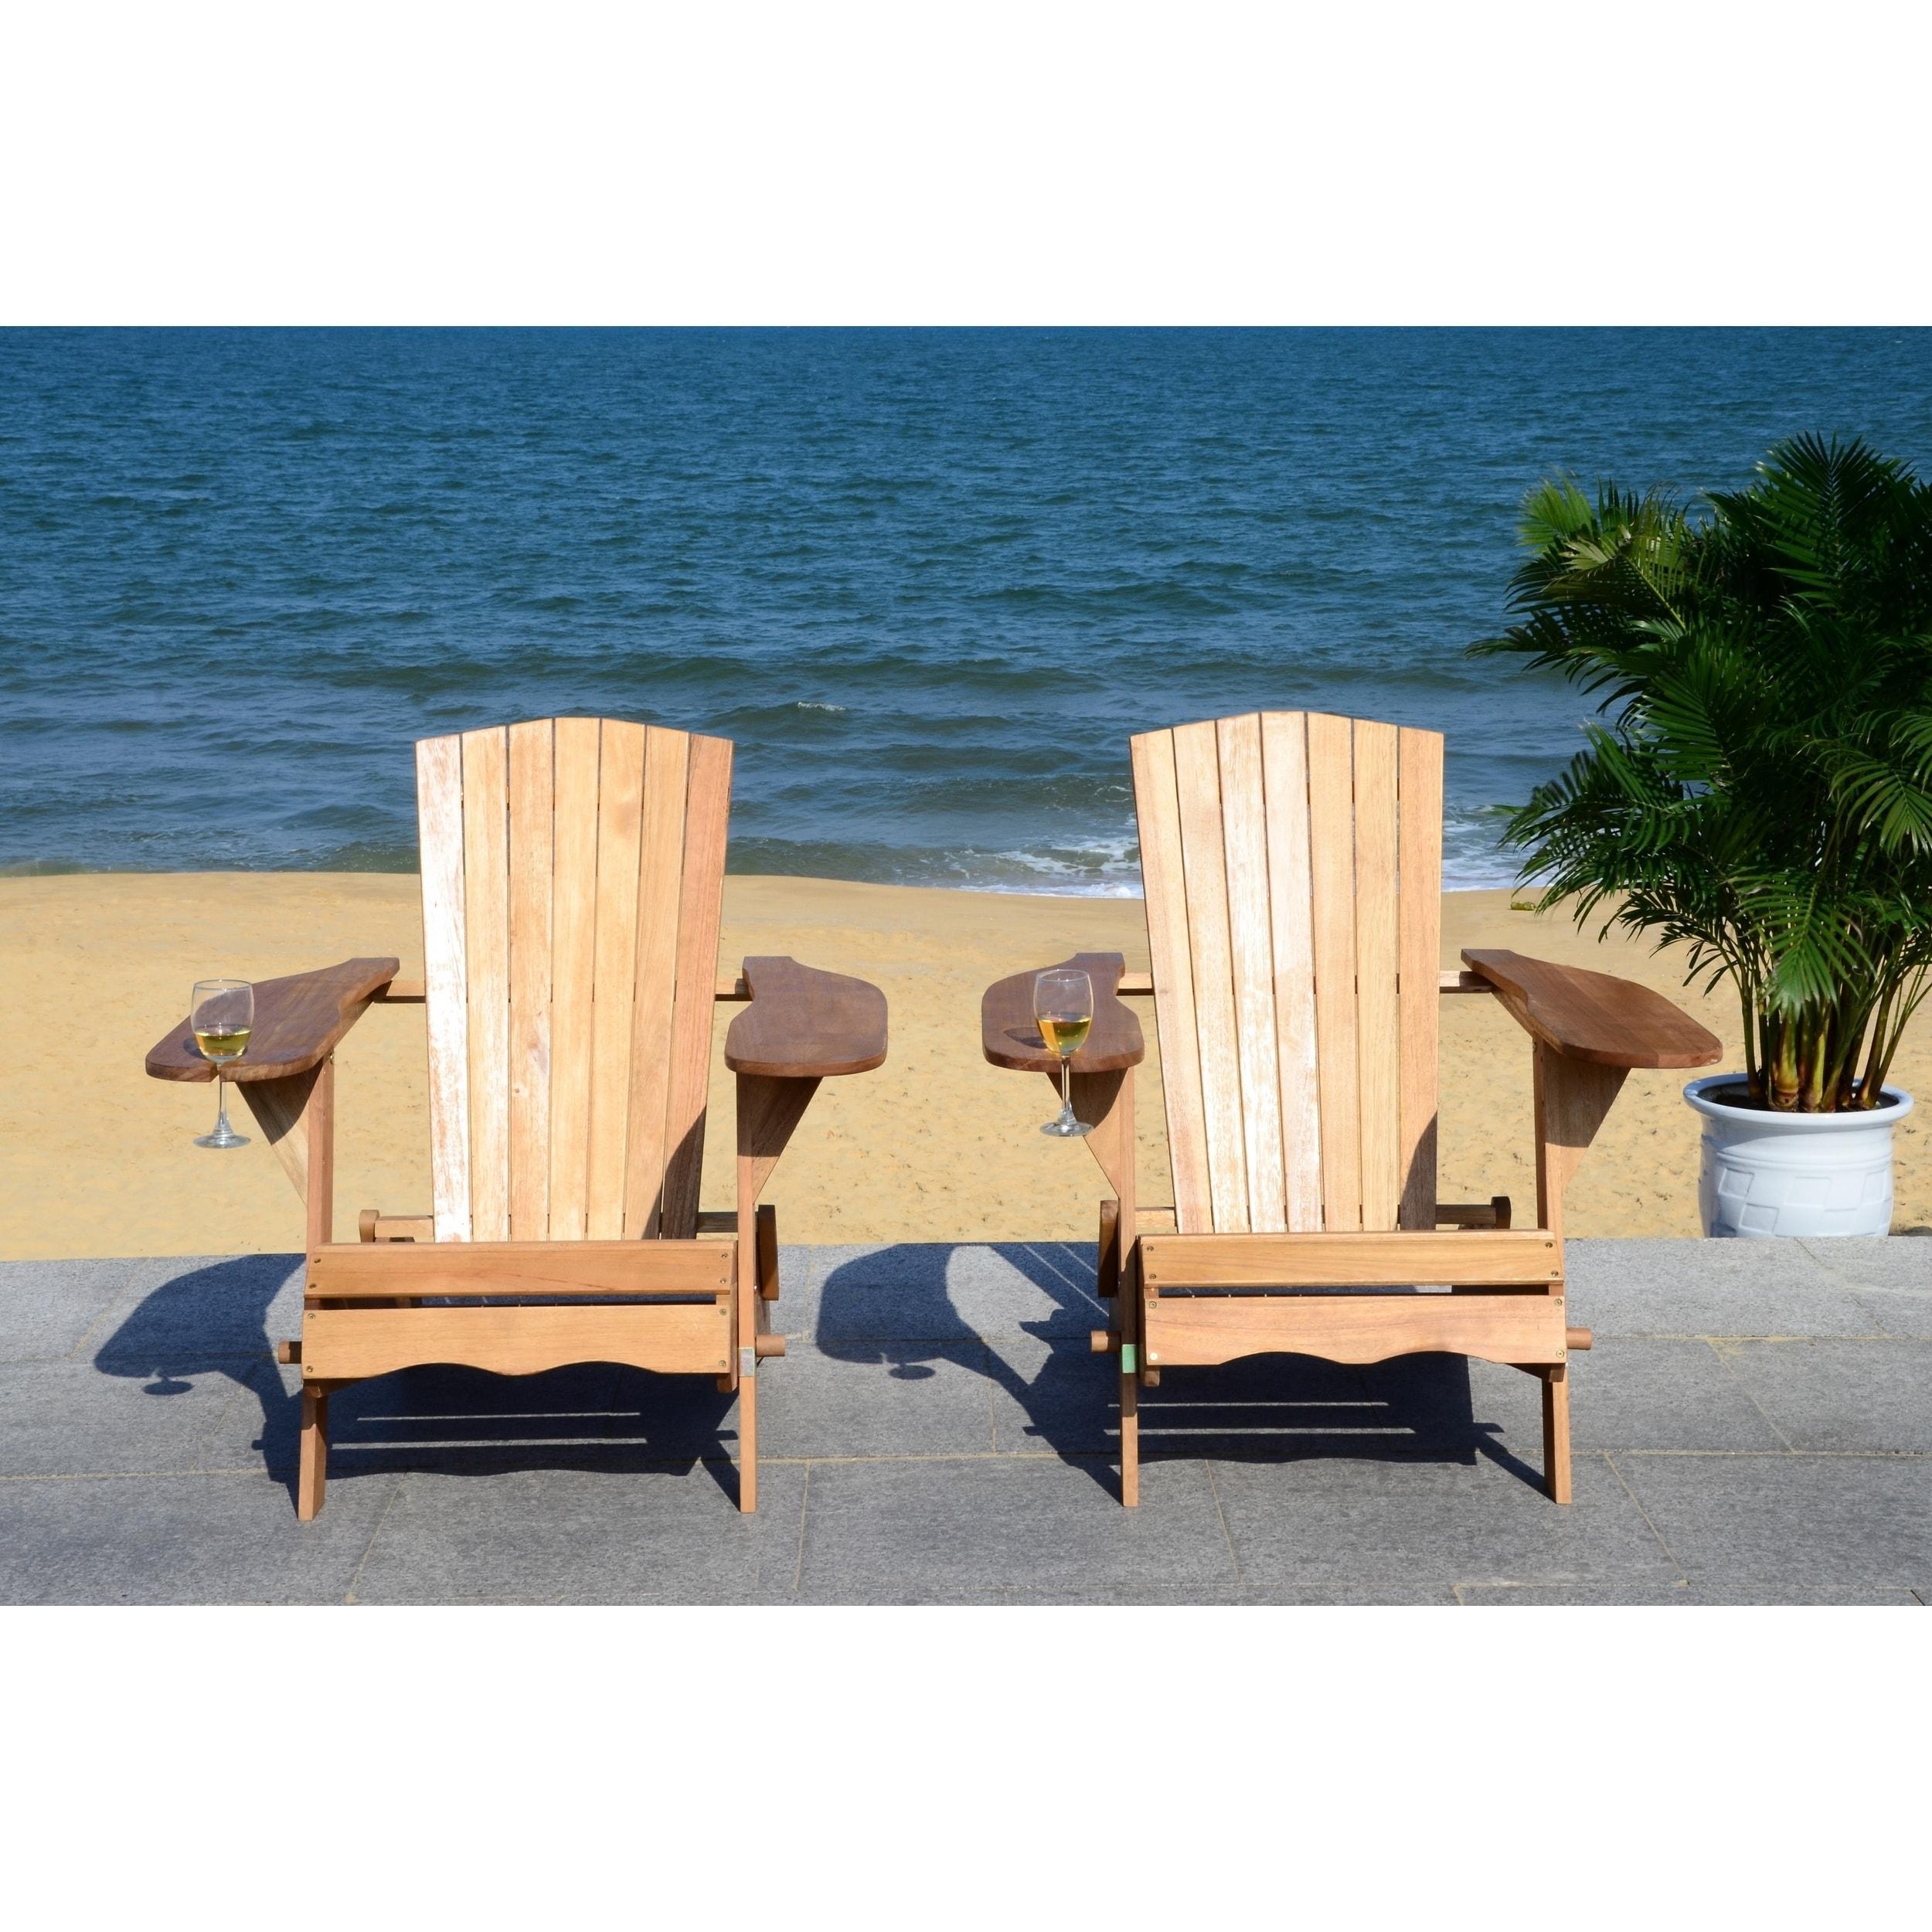 Shop Safavieh Breetel Natural Set Of 2 Adirondack Chairs - Free ...